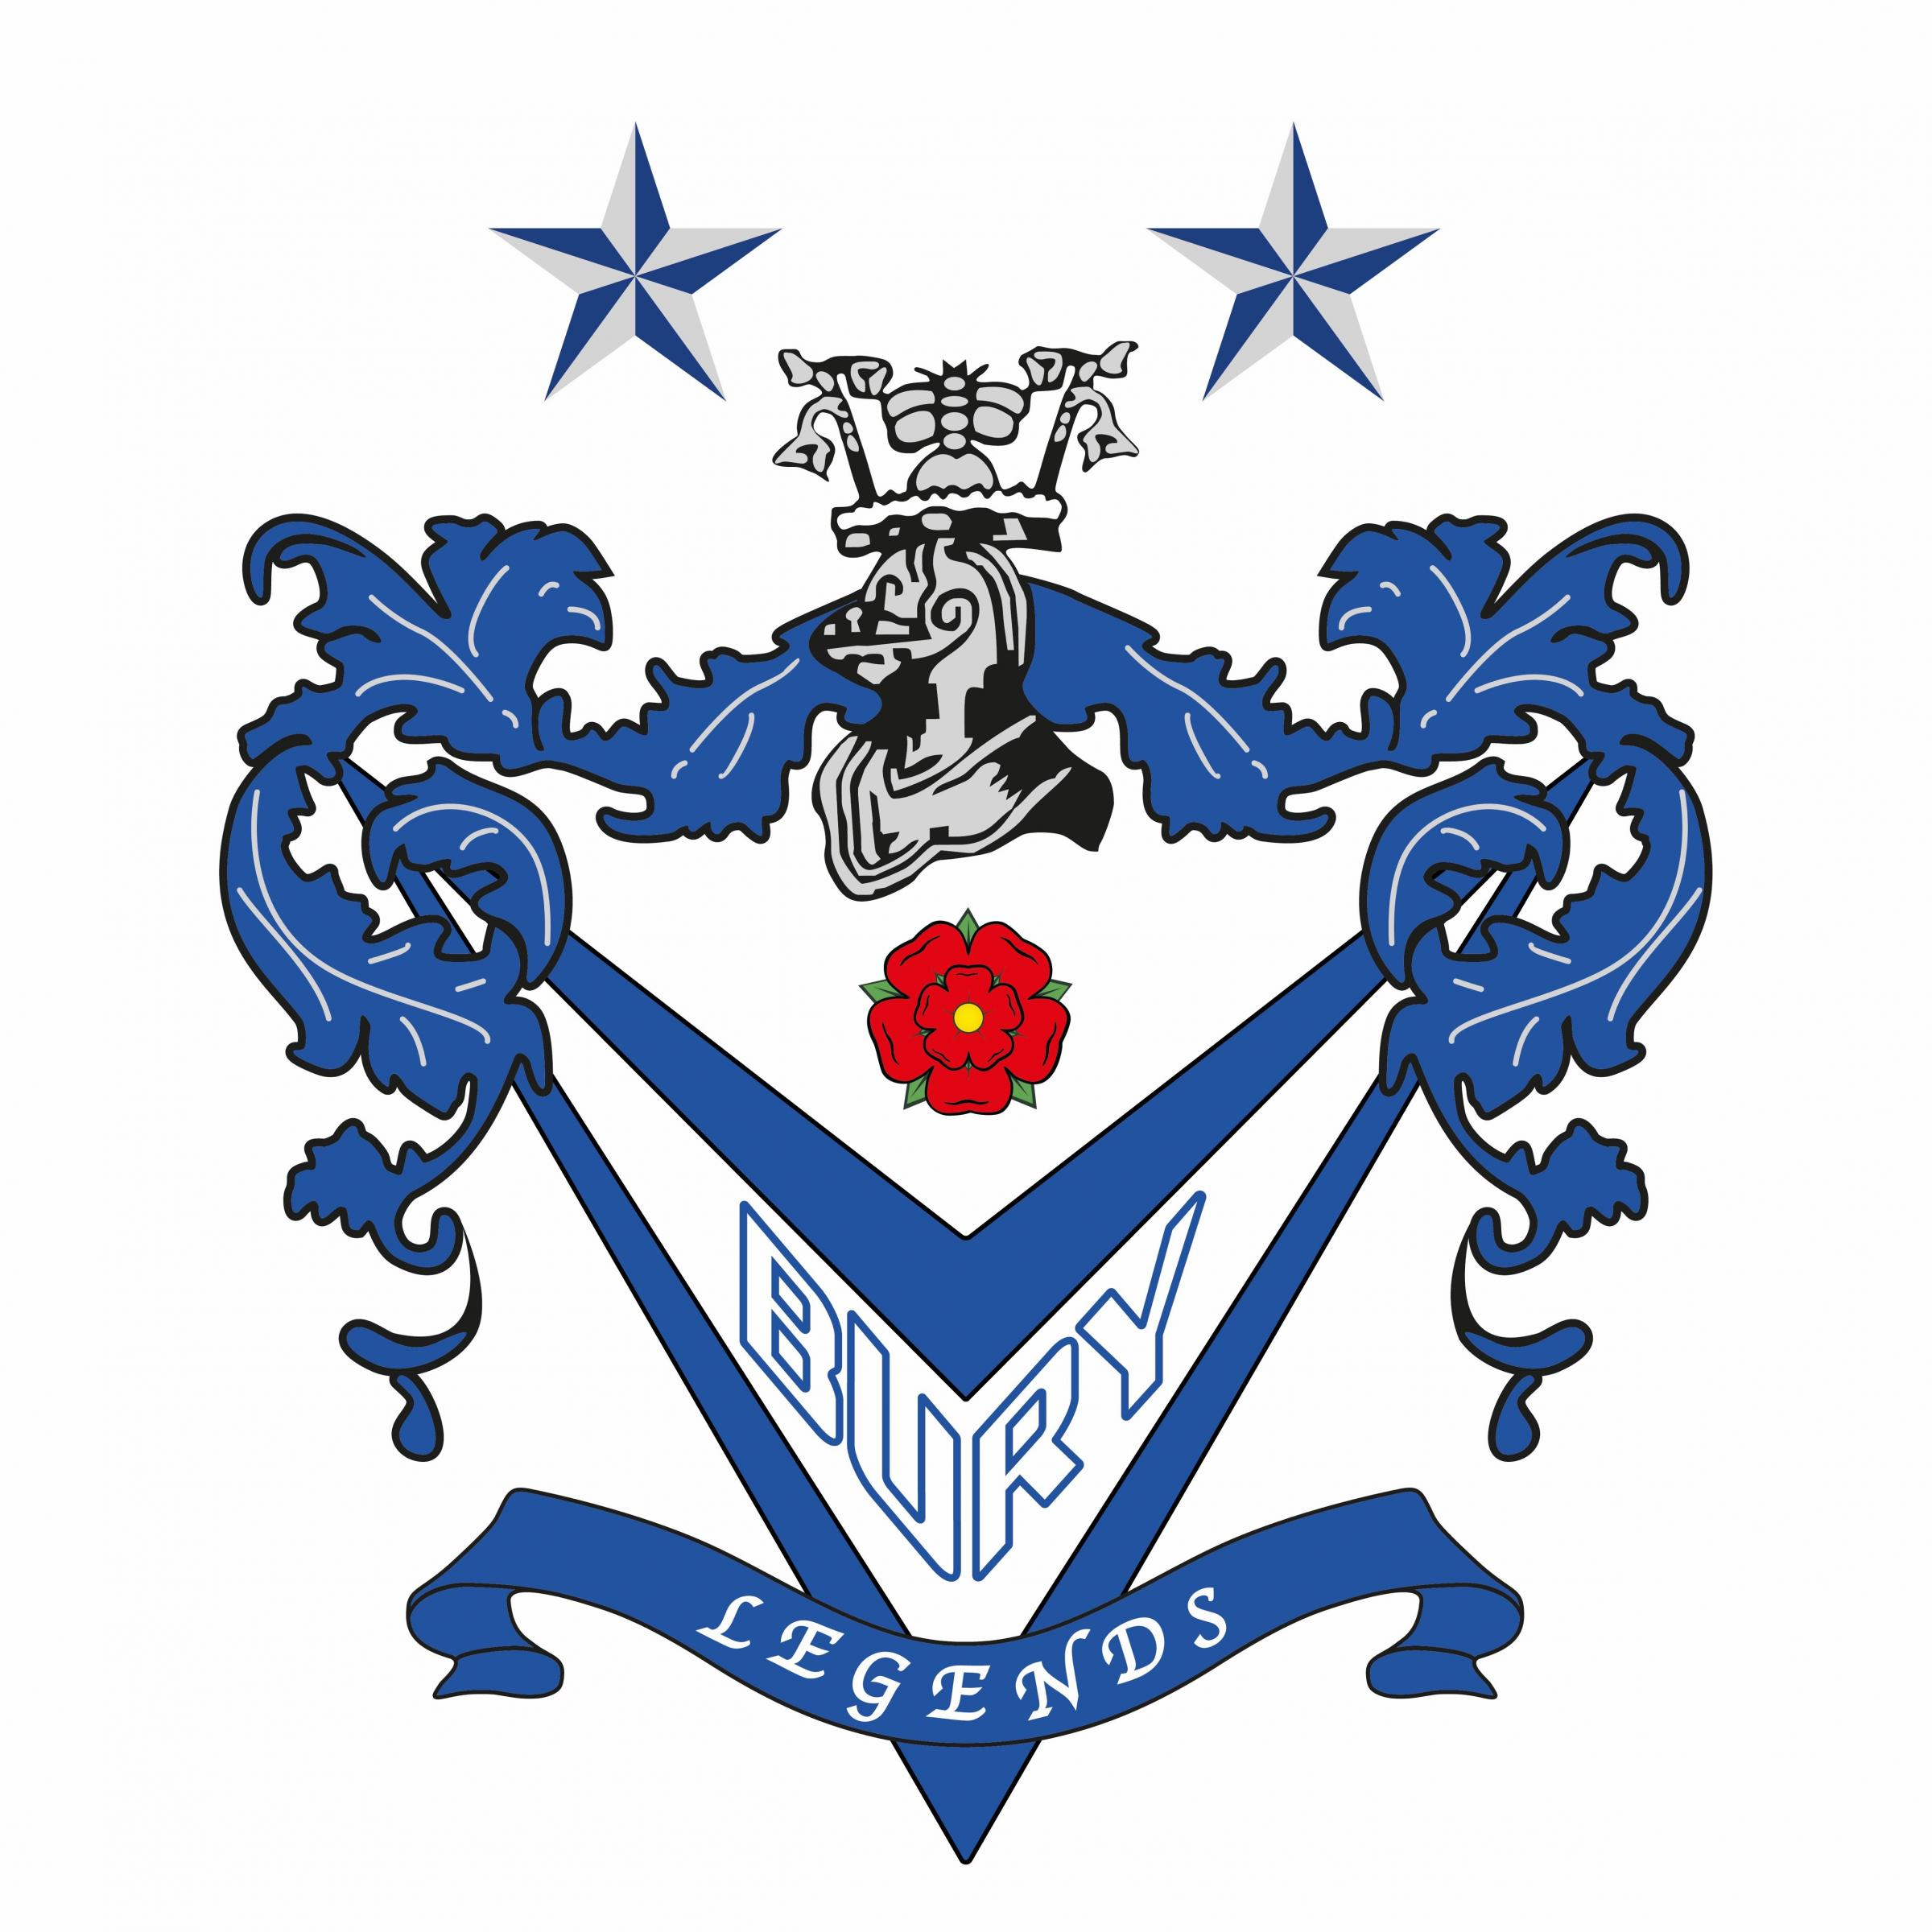 Bury phoenix club announce major Chester fundraising match